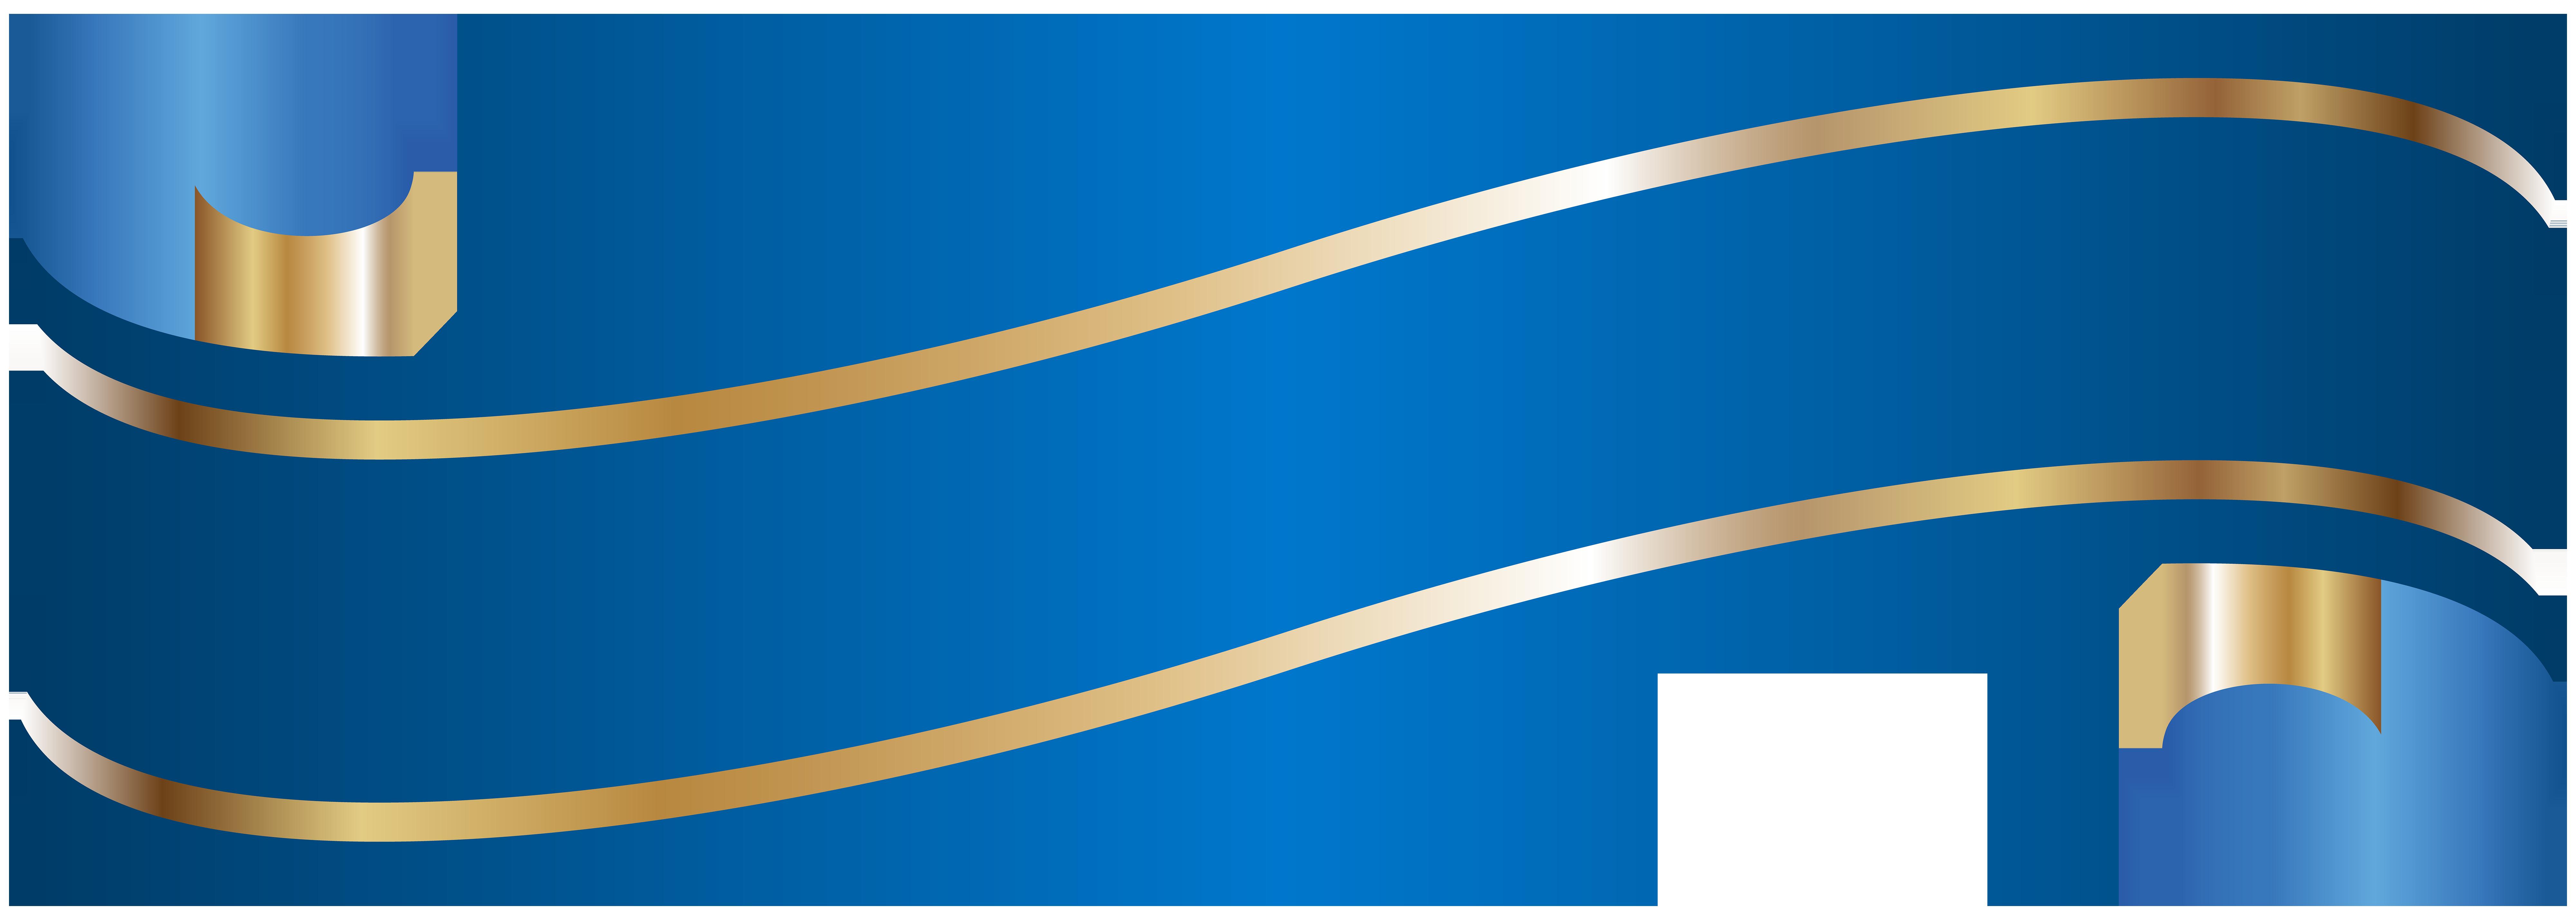 8000x2847 Elegant Banner Blue Png Clip Artu200b Gallery Yopriceville